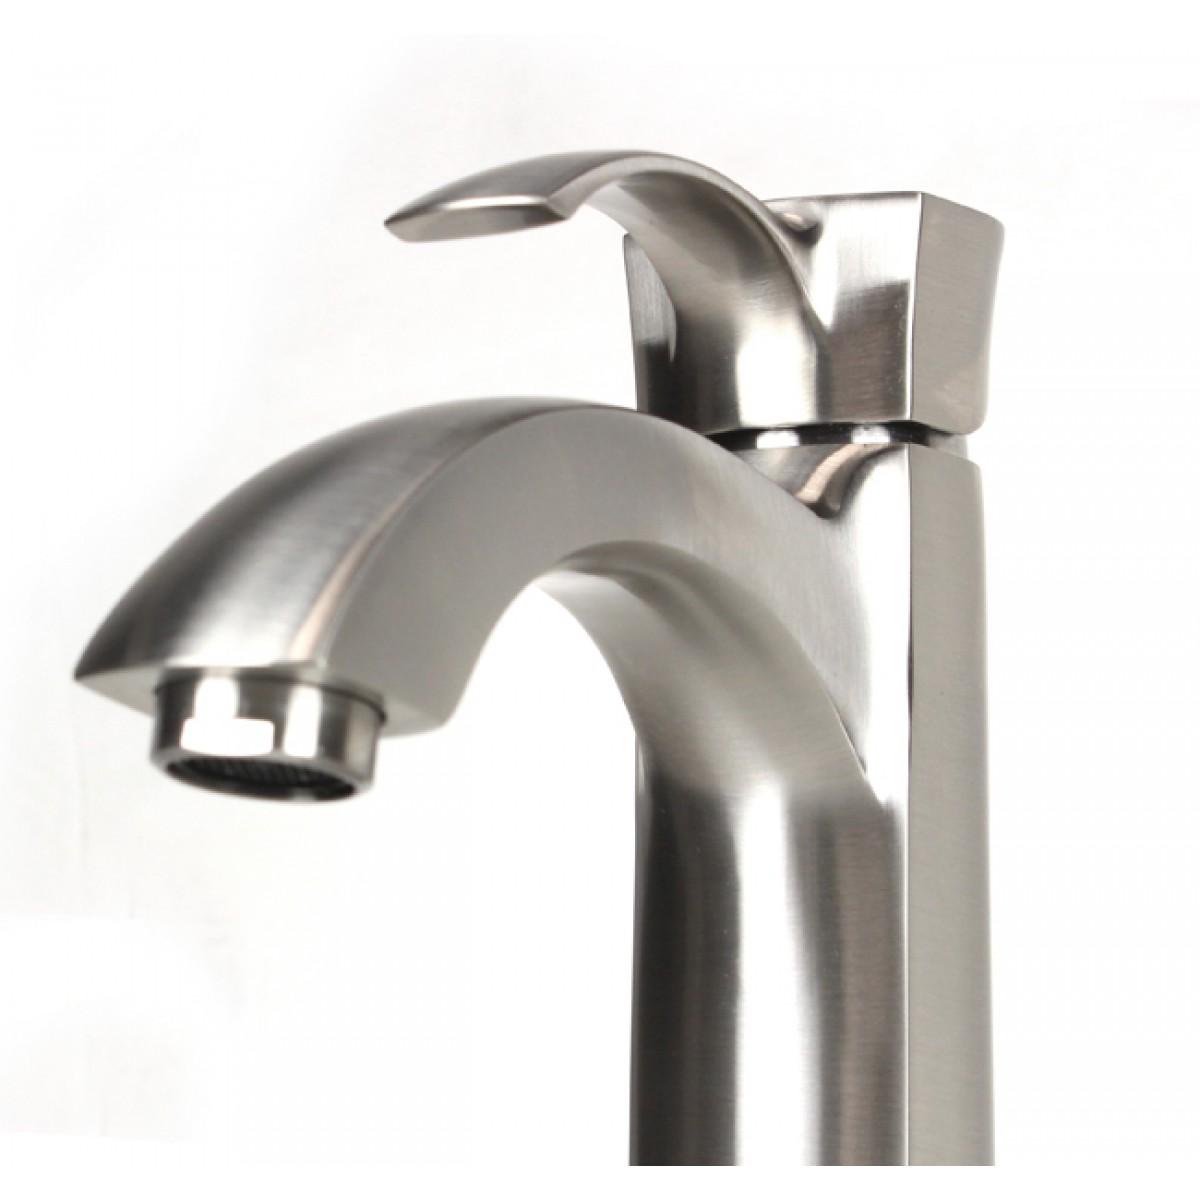 12 Inch Vessel Sink : ... Free Brushed Nickel Bathroom Lavatory Vessel Sink Faucet - 12 x 9 Inch